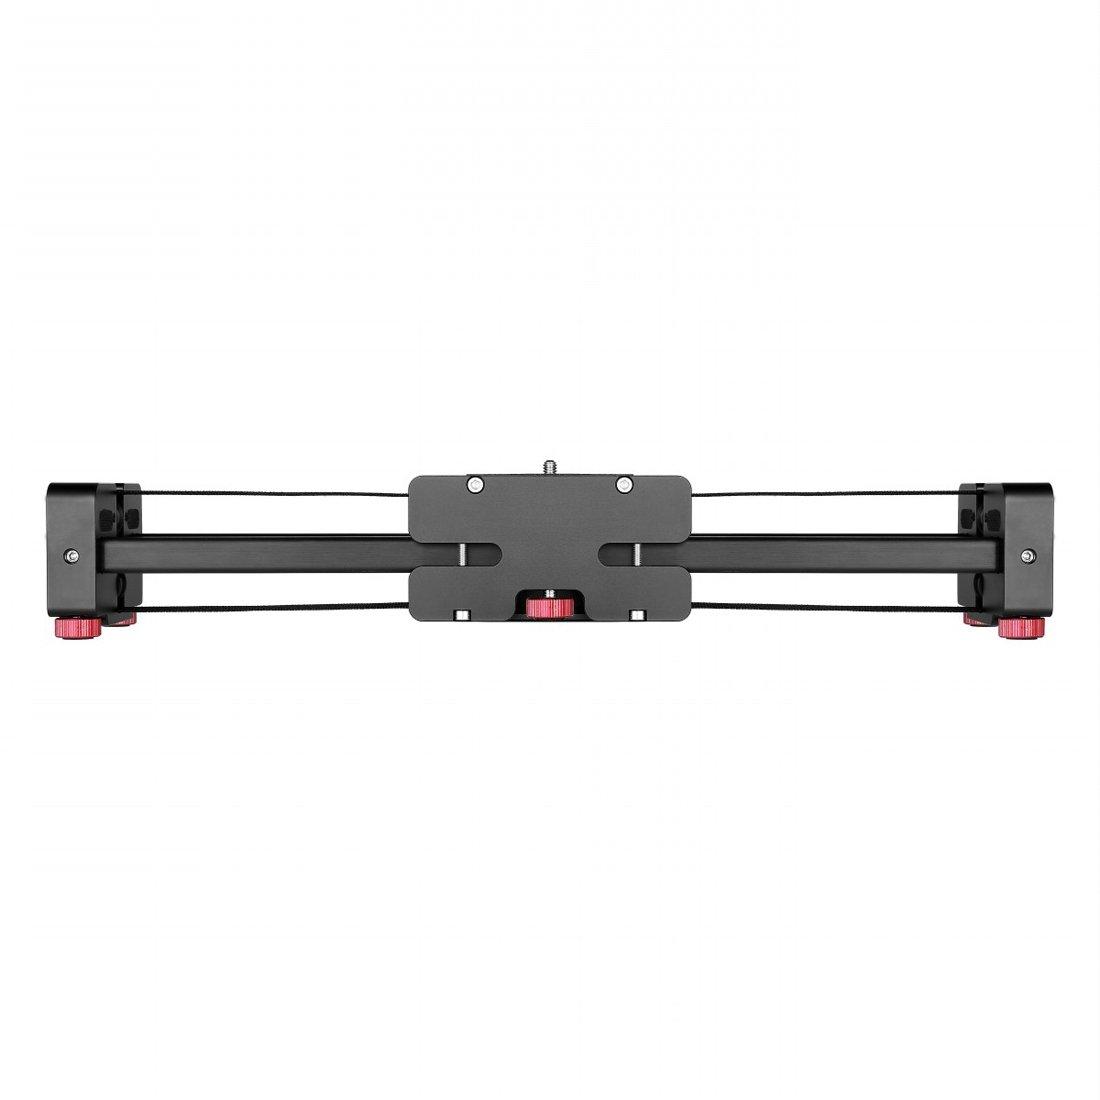 XIAOMIN FT-40 Portable 36cm / 80cm (Installs on Tripod) Slide Rail Track for DSLR/SLR Cameras/Video Cameras (Black) Premium Material (Color : Black) by XIAOMIN